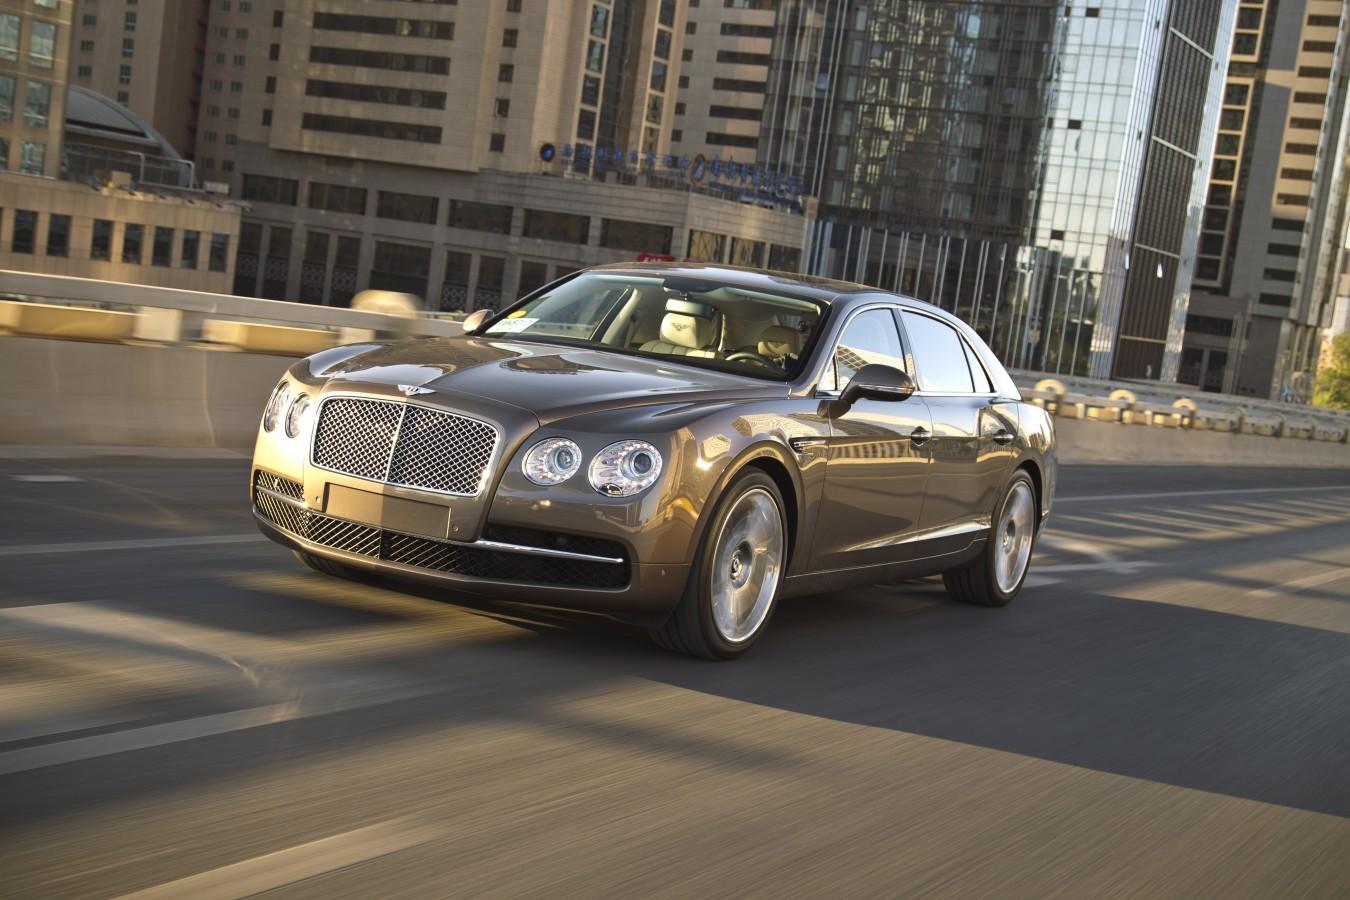 BENTLEY С ПРОБЕГОМ В КРЕДИТ ОТ 2 950 000 РУБЛЕЙ* - изображение Bentley-Flying-Spur-2 на Bentleymoscow.ru!